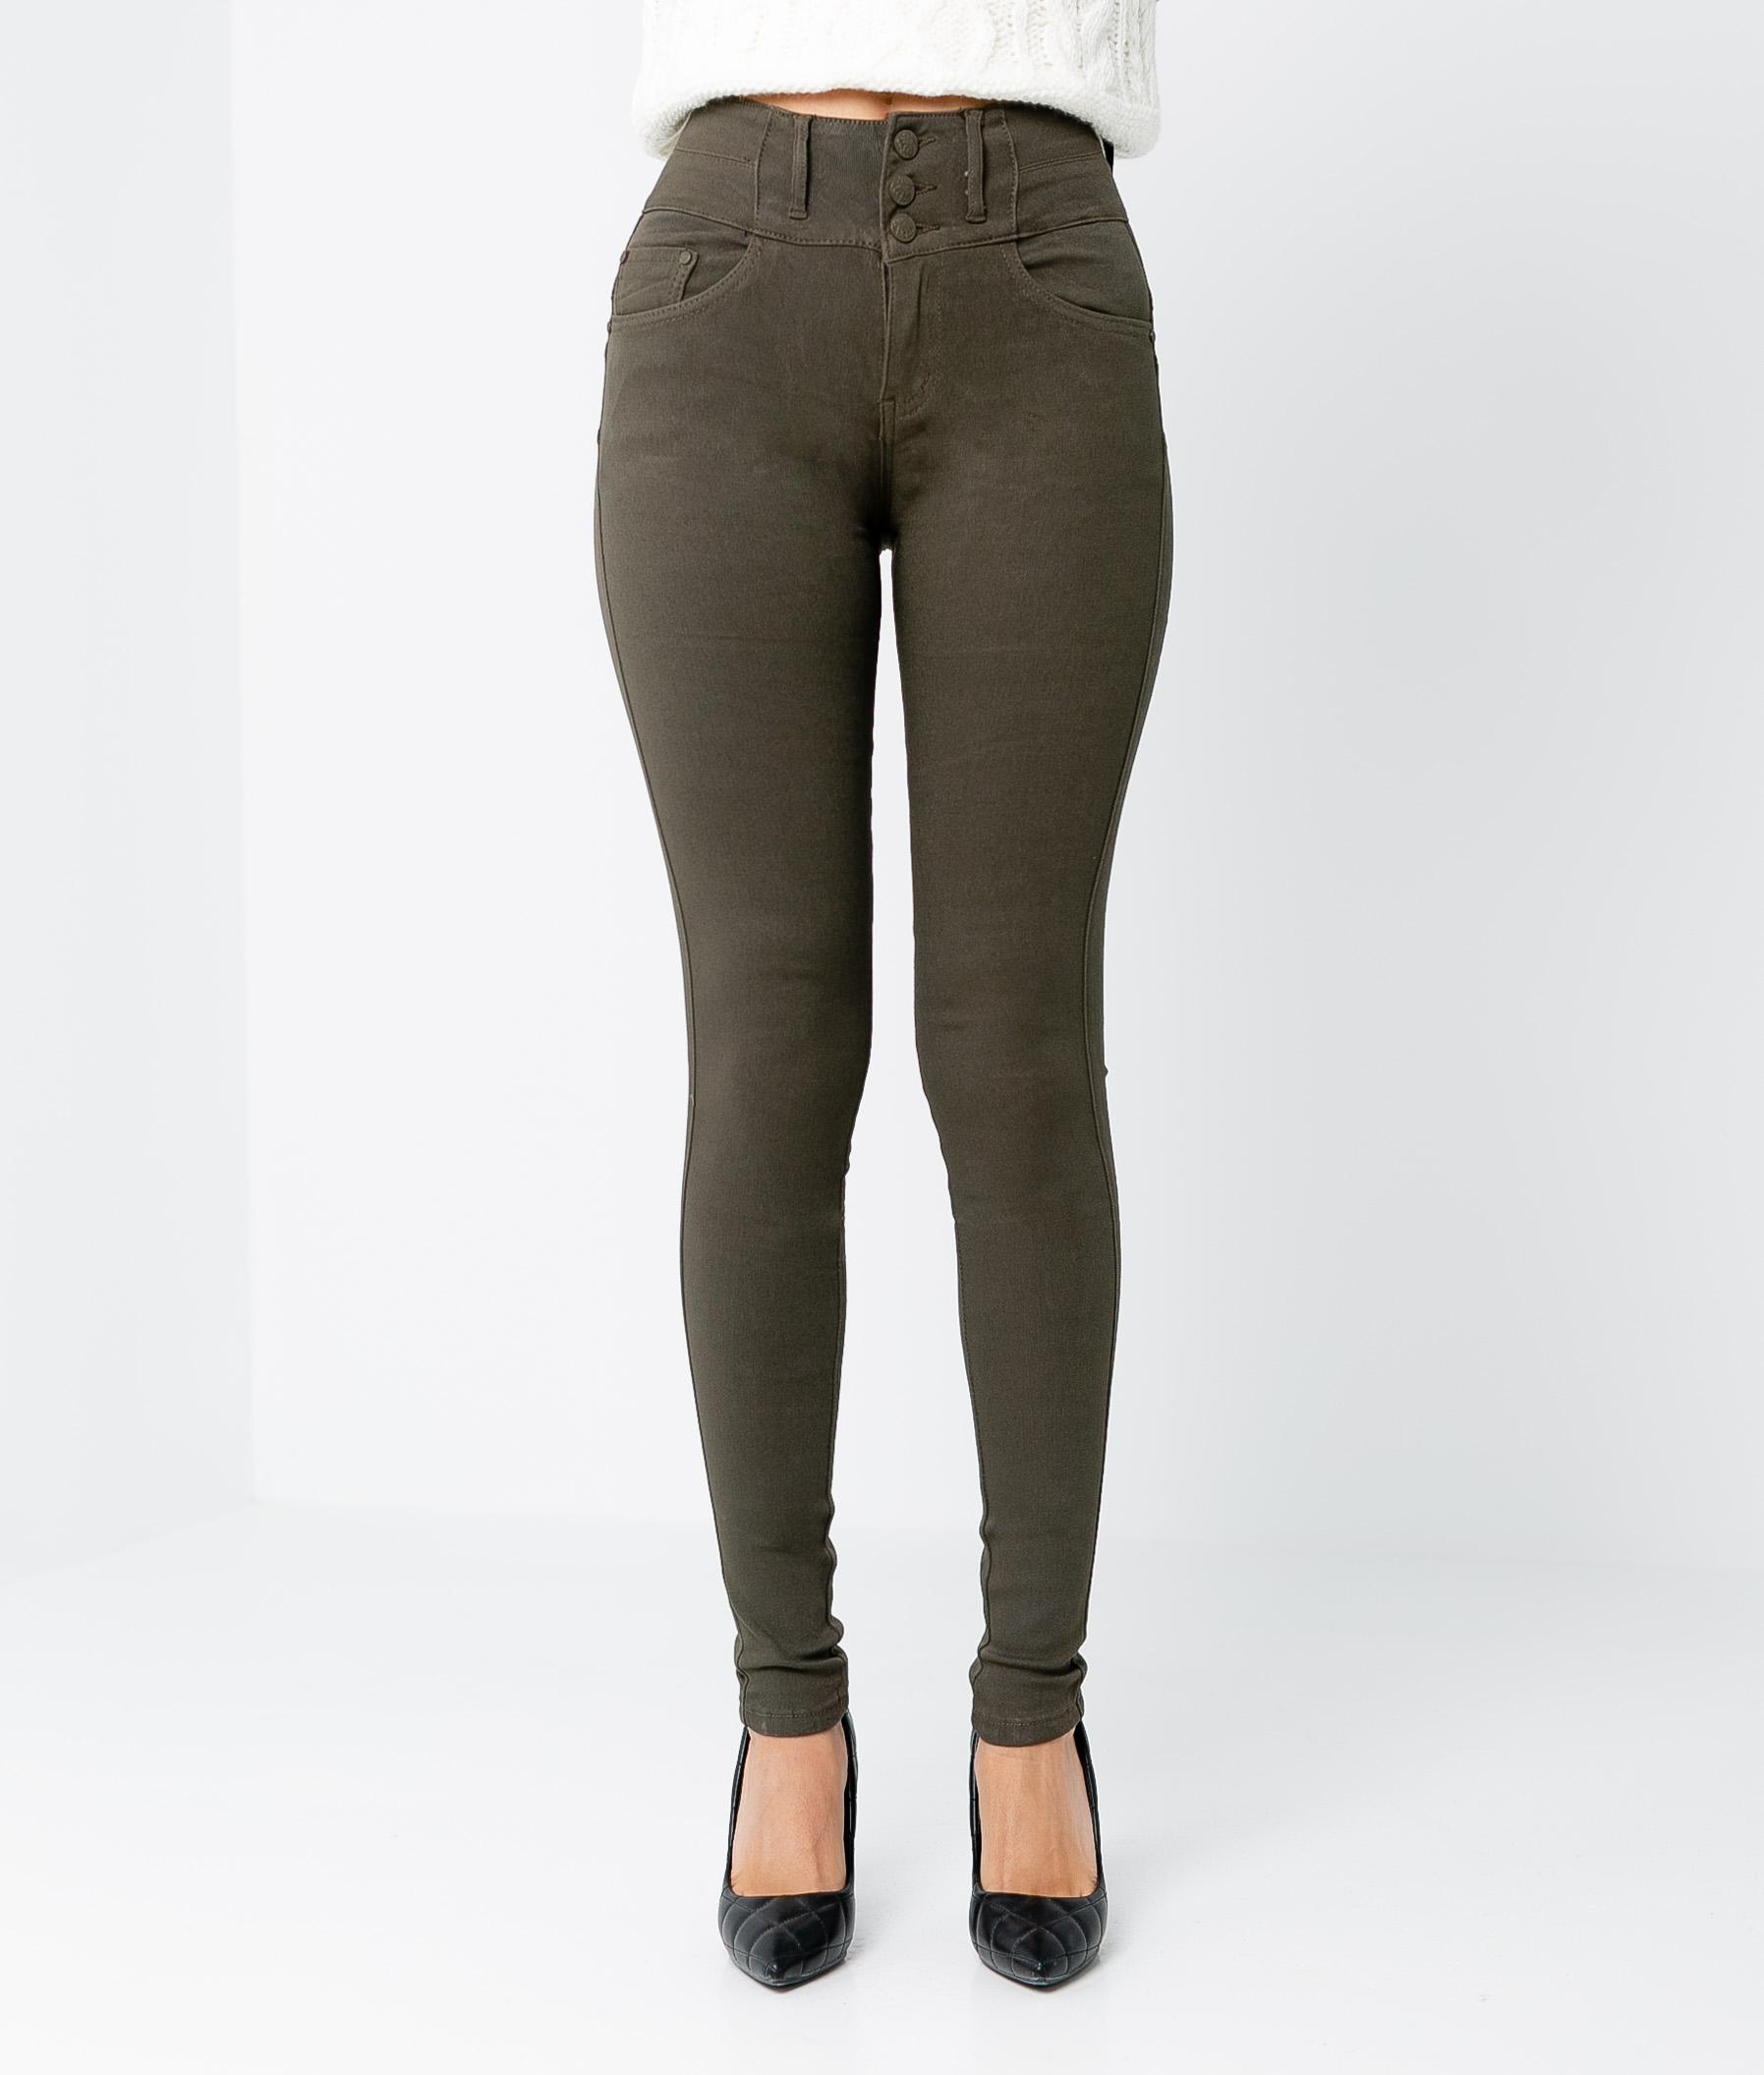 Pantalon Subama - Kaki